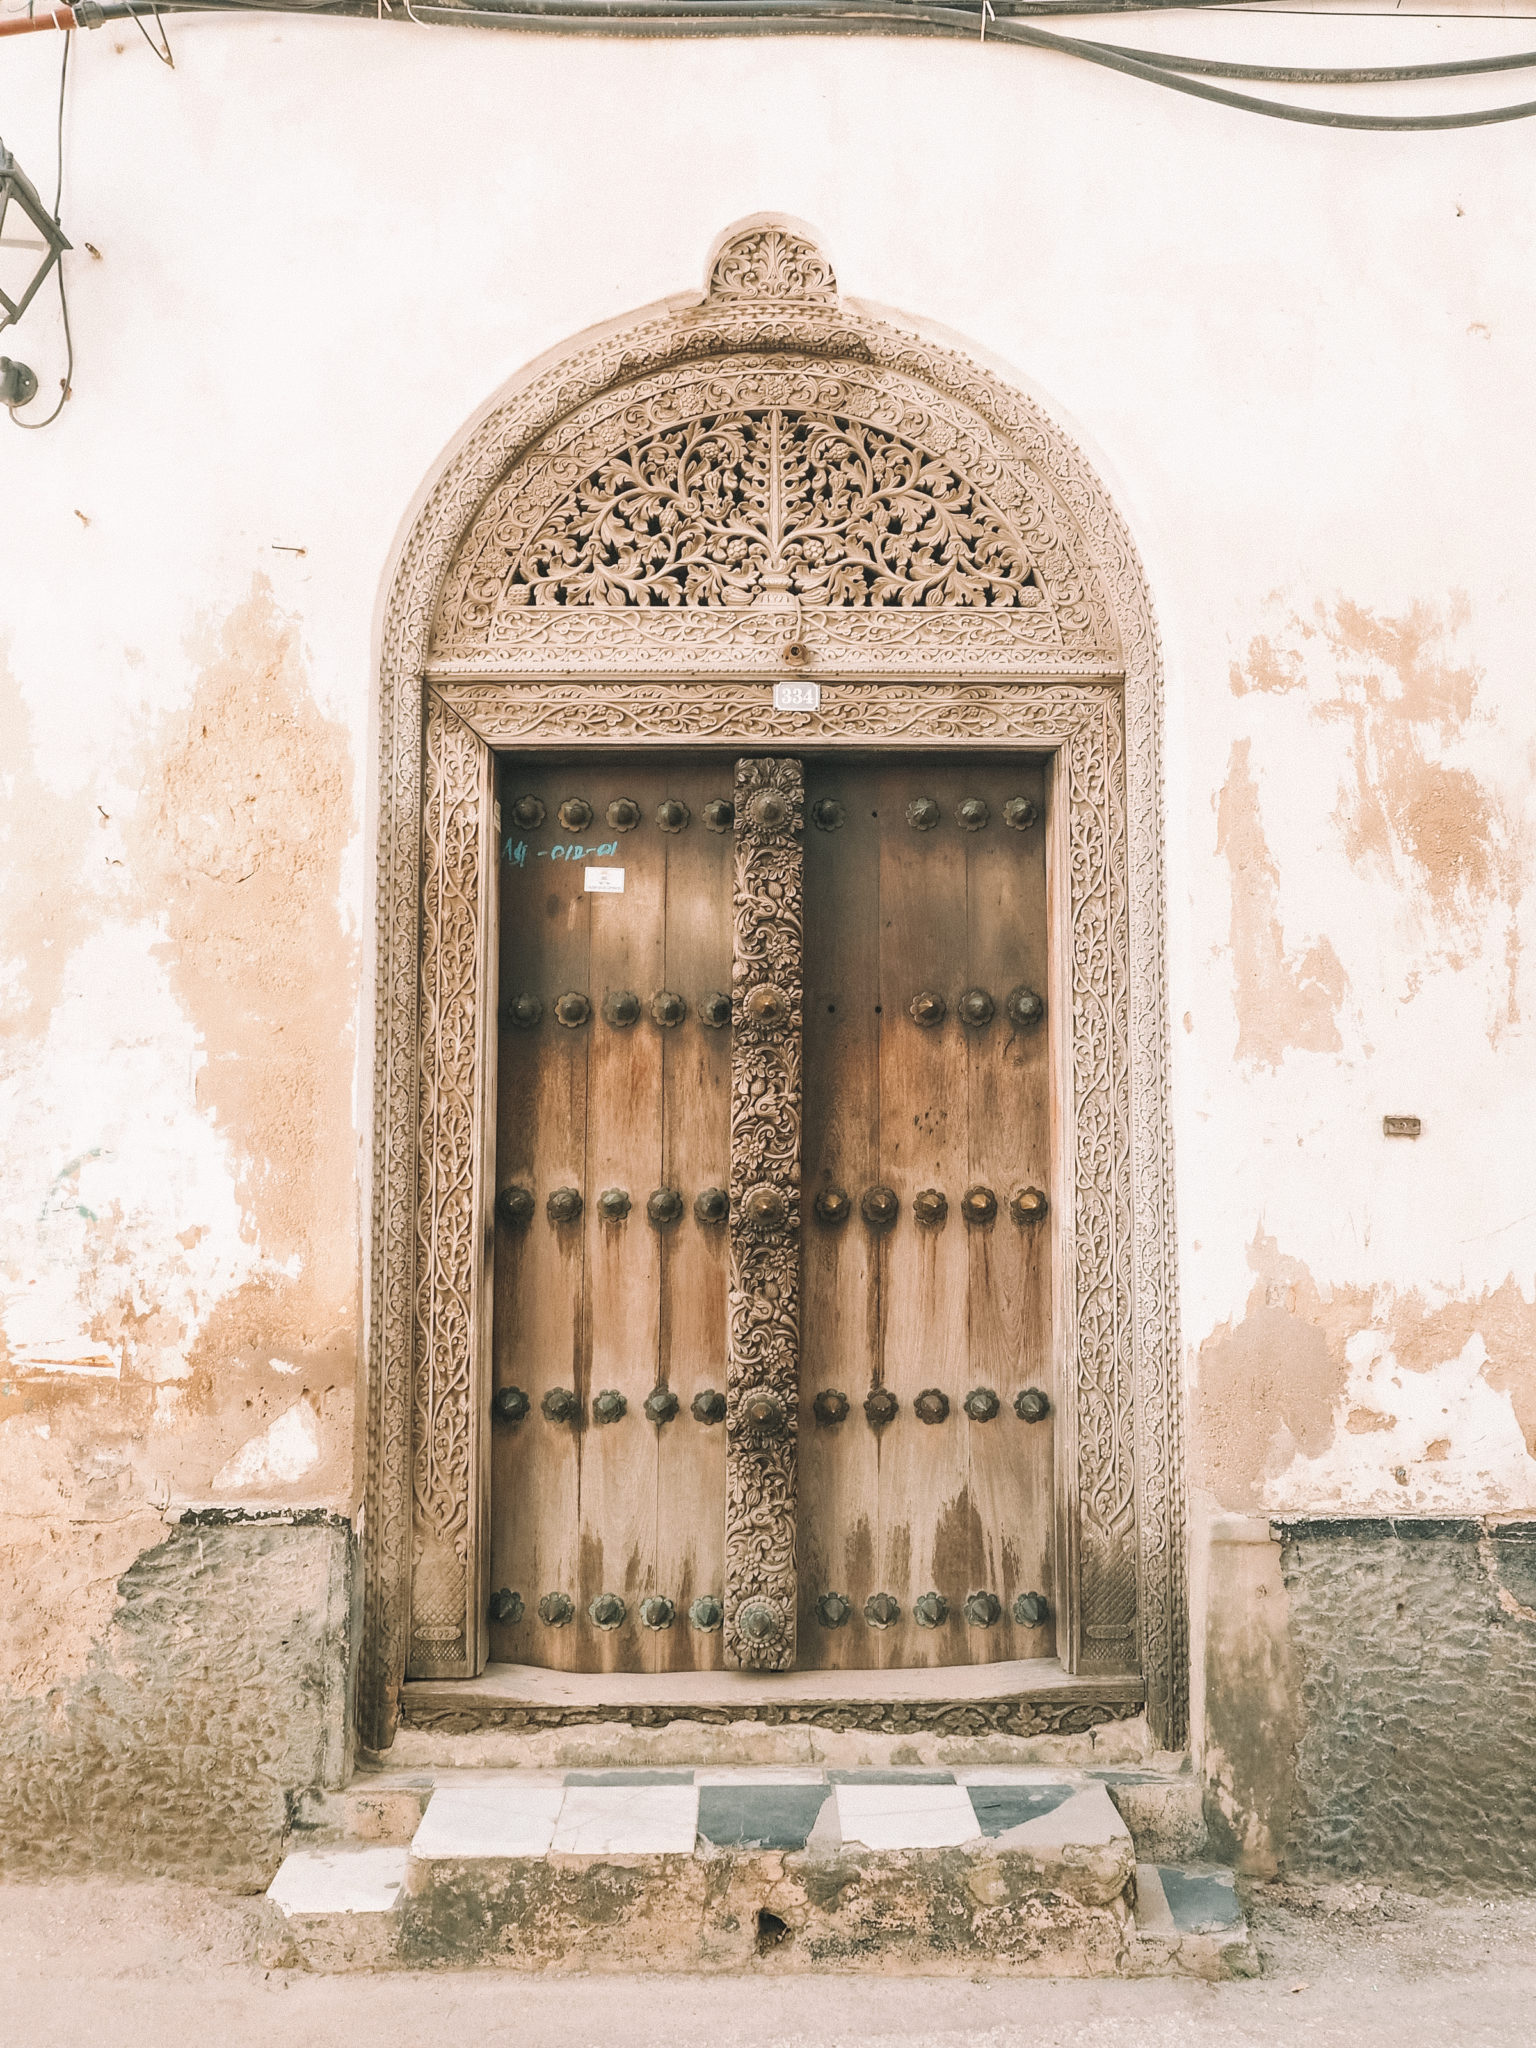 One day in Stone Town Zanzibar | WORLD OF WANDERLUST